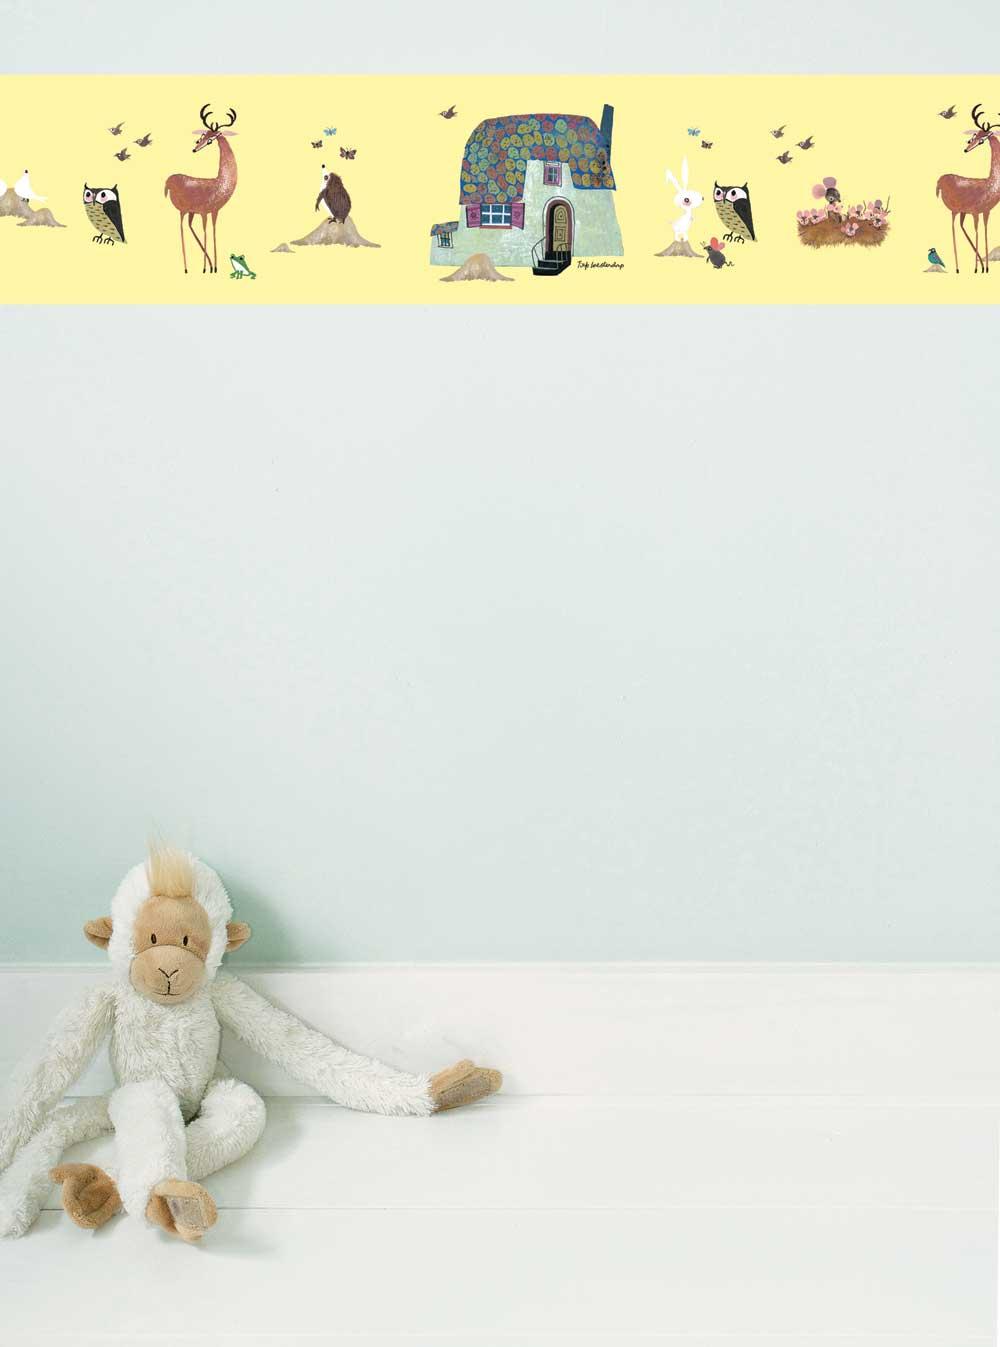 Full Size of Bordüren Kinderzimmer Kek Amsterdam Bordre Tiere Im Wald Gelb Bei Rume Regale Regal Weiß Sofa Kinderzimmer Bordüren Kinderzimmer